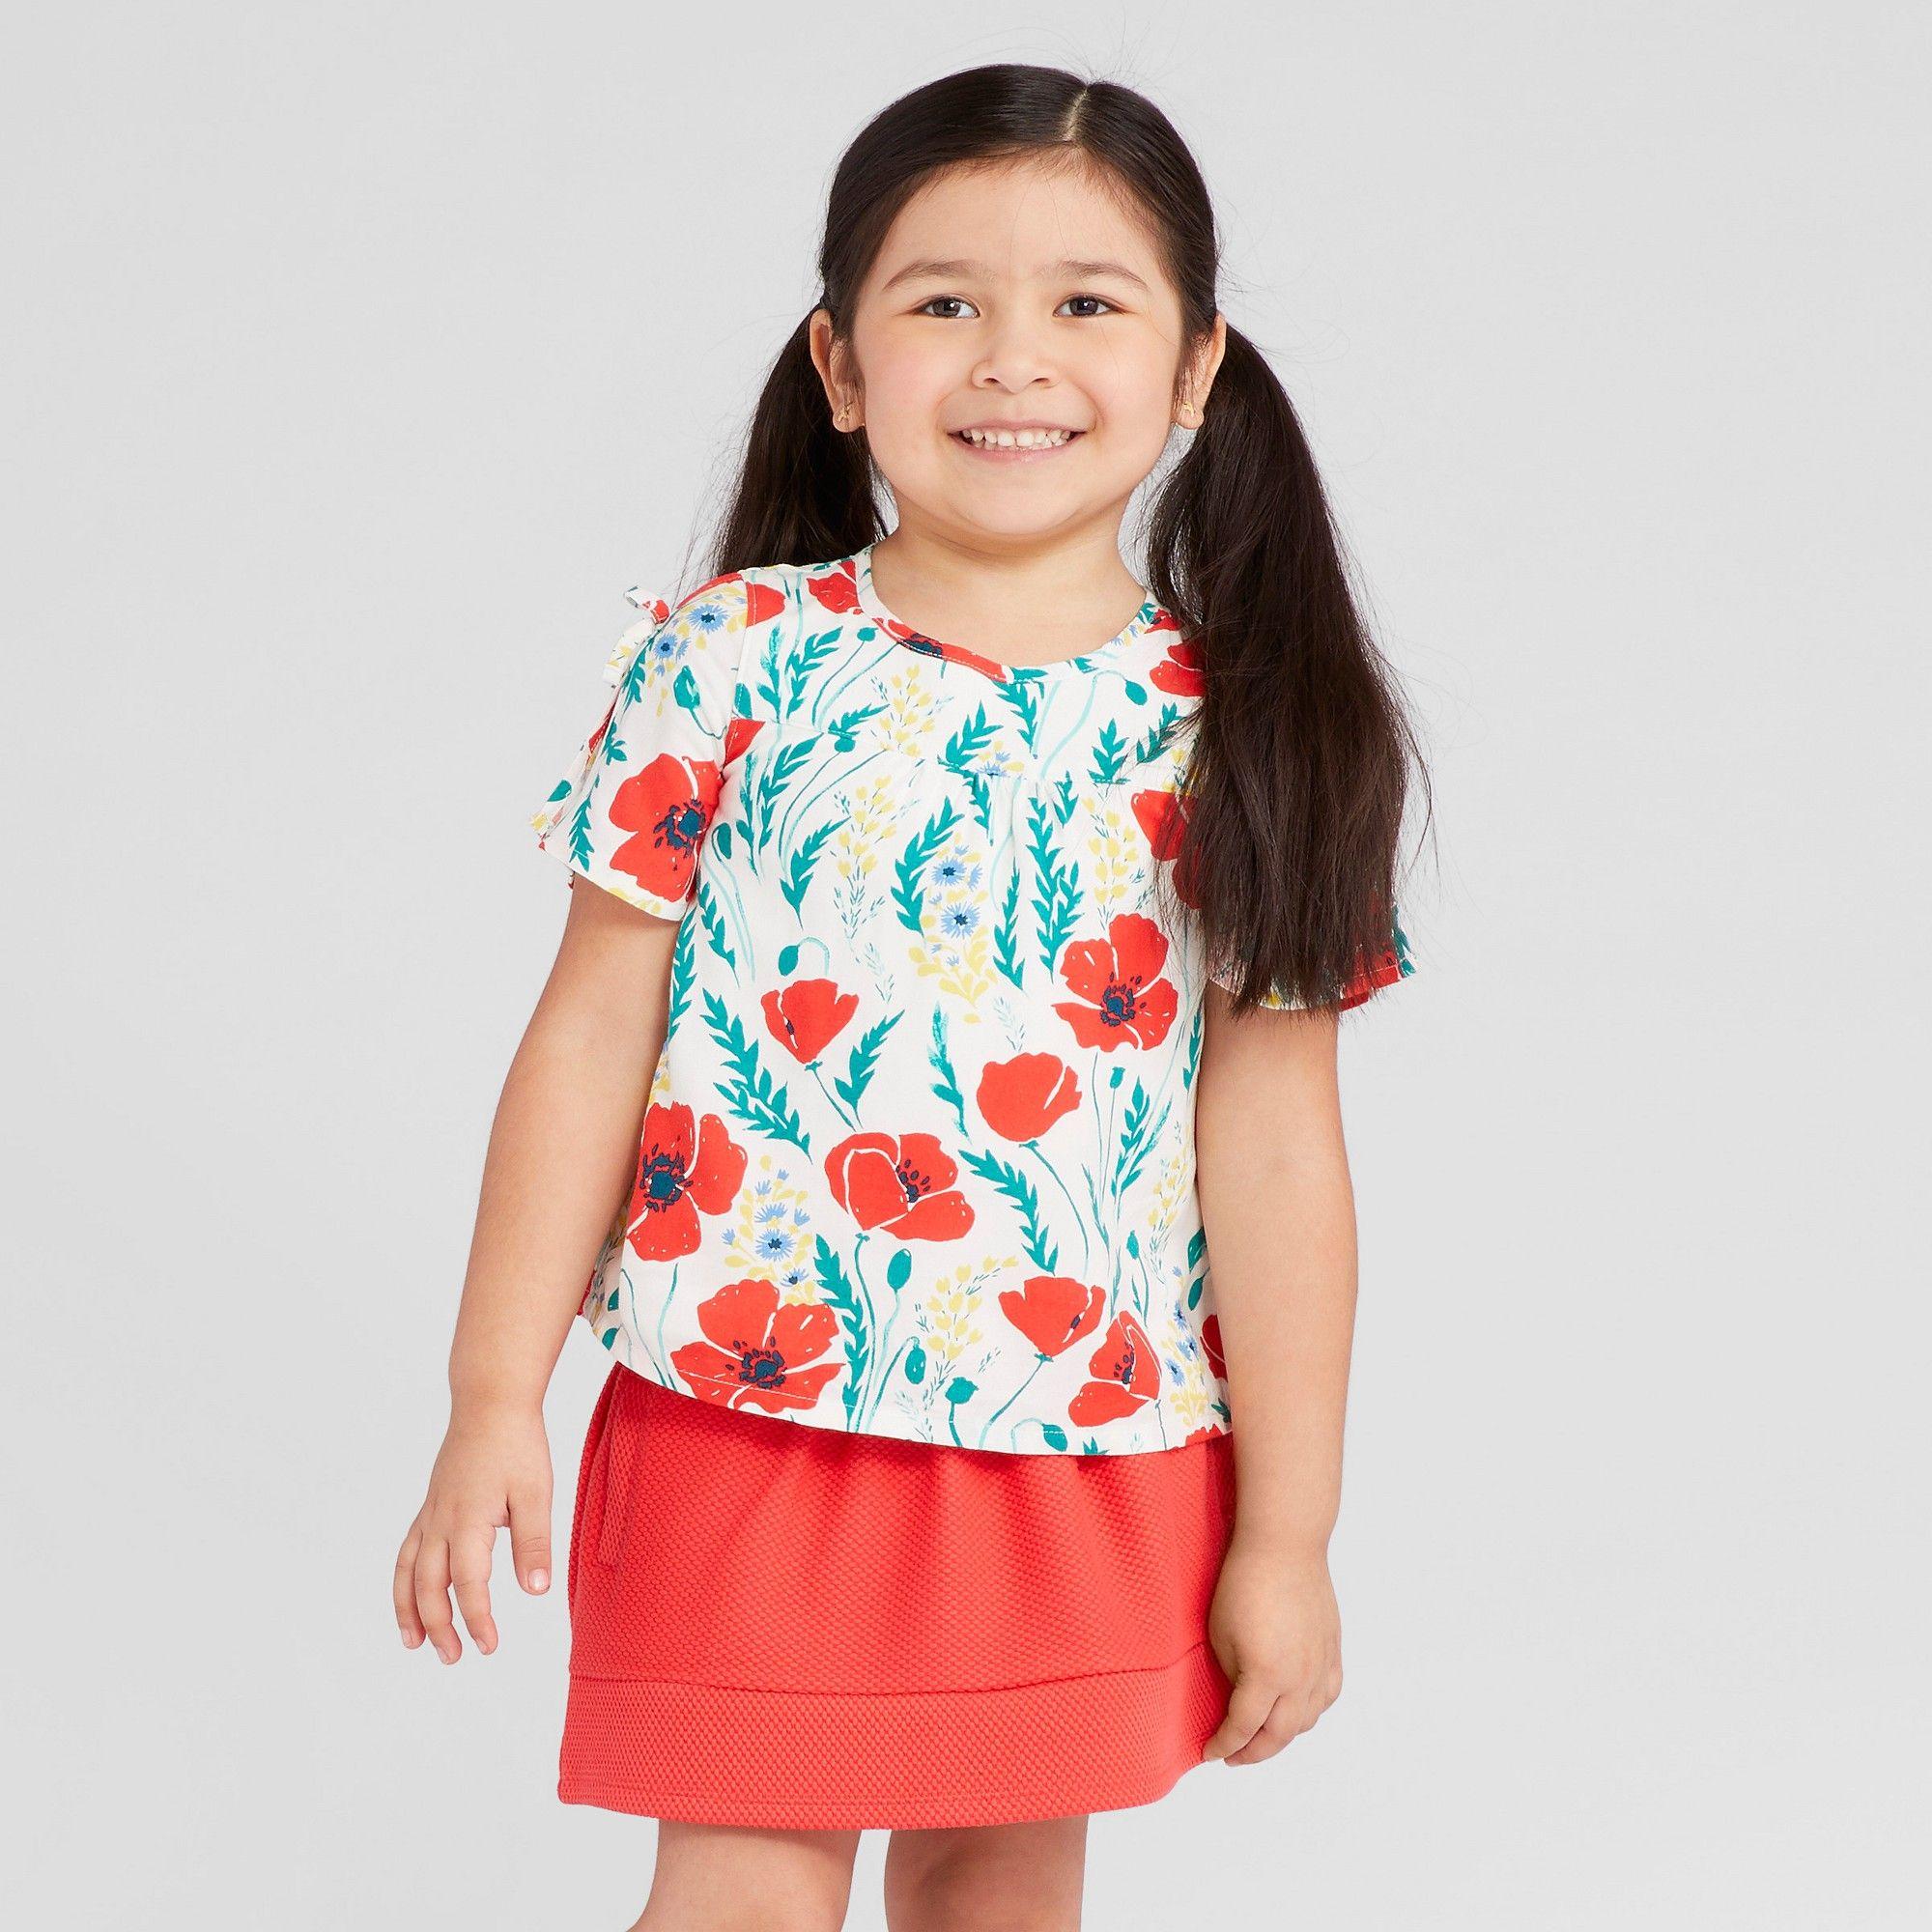 80bb57eee8f6 Toddler Girls  Open Sleeve Top - Genuine Kids from OshKosh Gallery ...